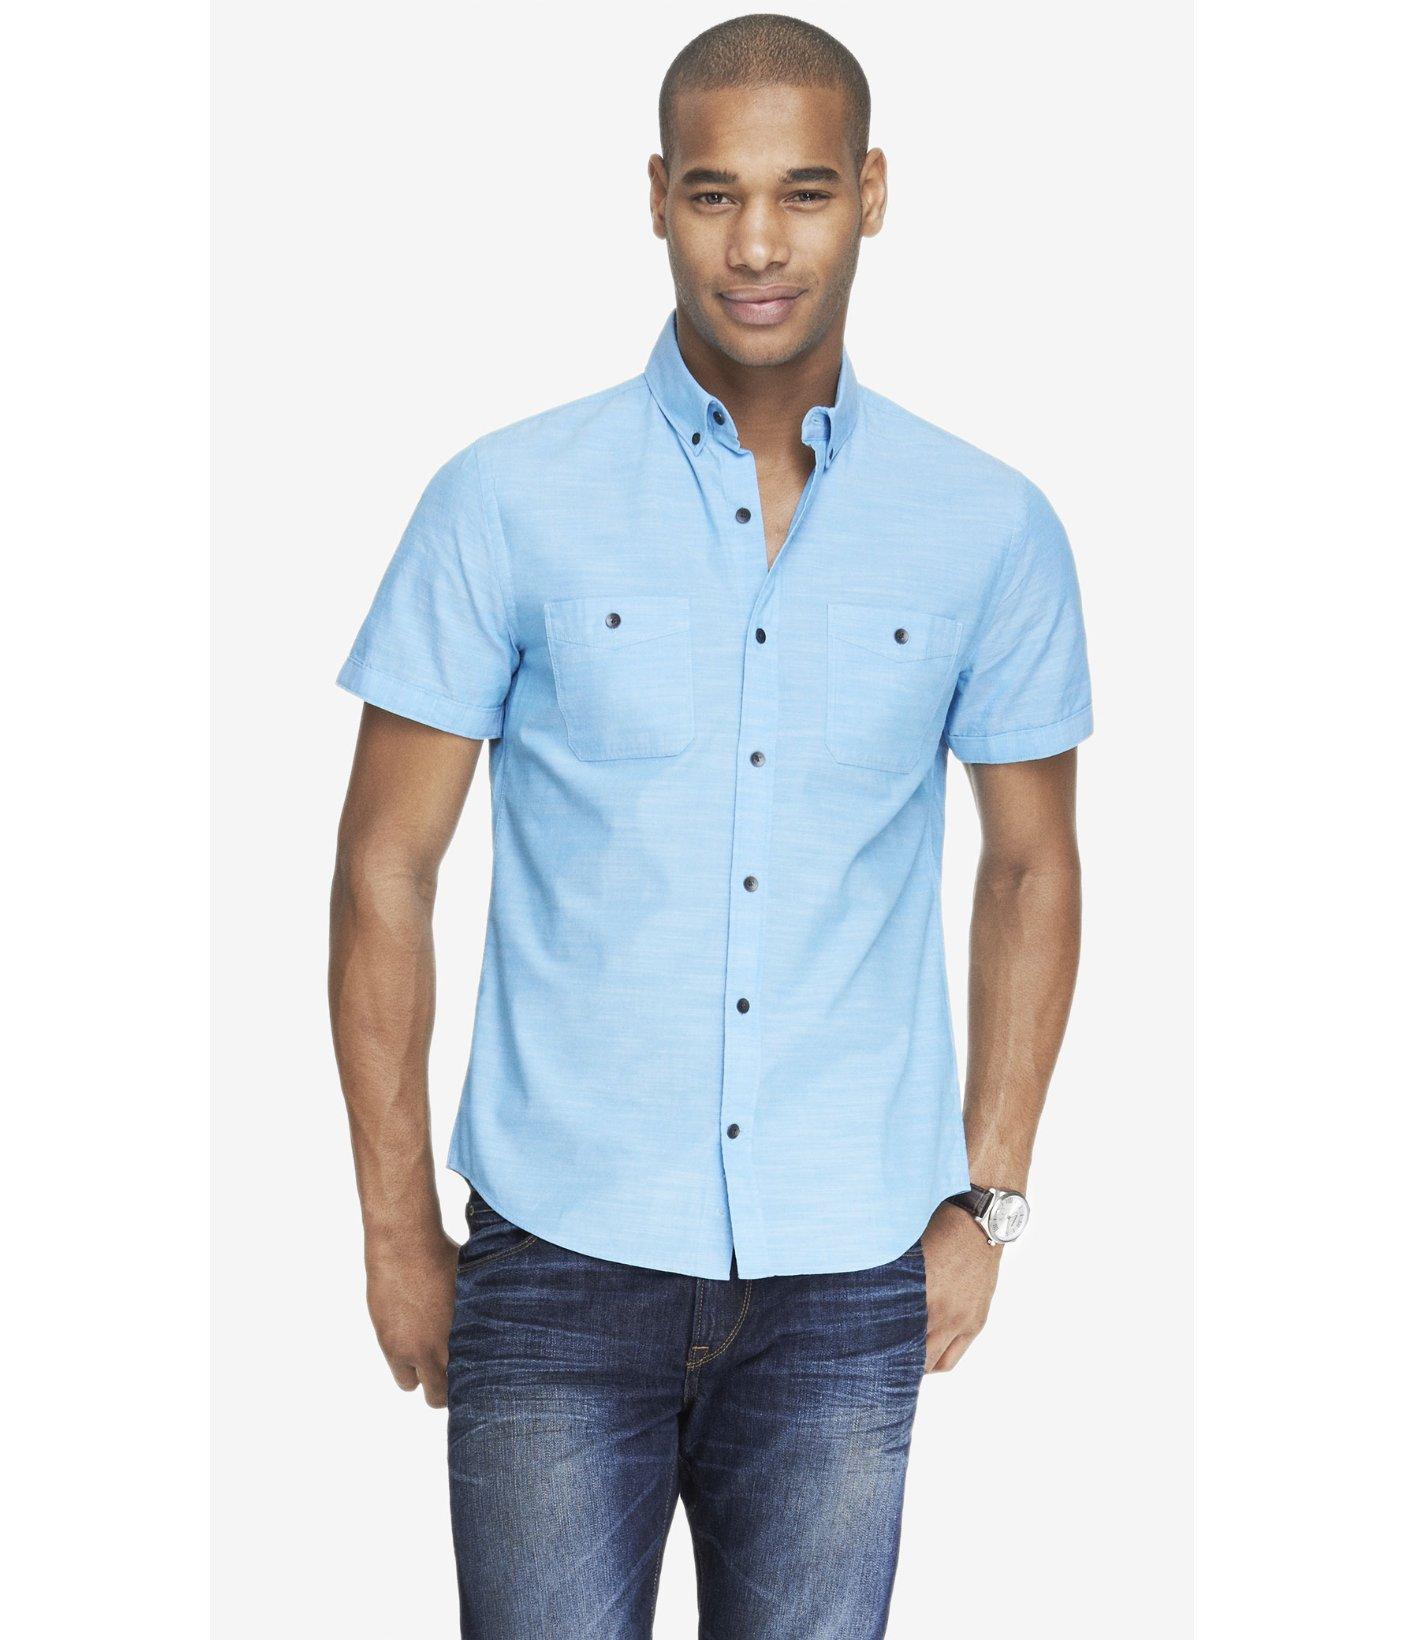 Express Short Sleeve Slub Chambray Shirt In Blue For Men